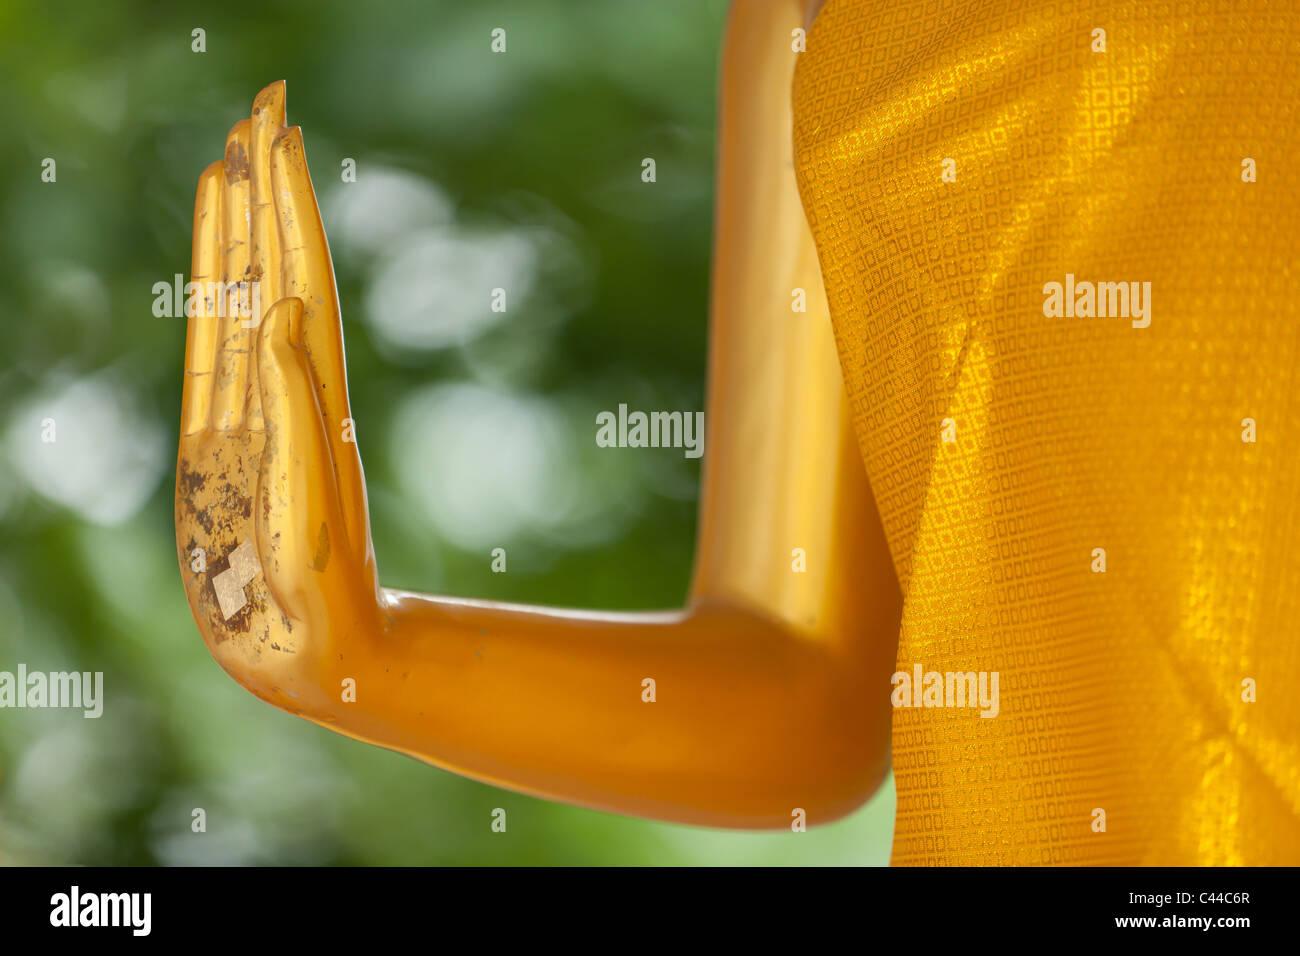 buddha hand stock photos buddha hand stock images alamy. Black Bedroom Furniture Sets. Home Design Ideas